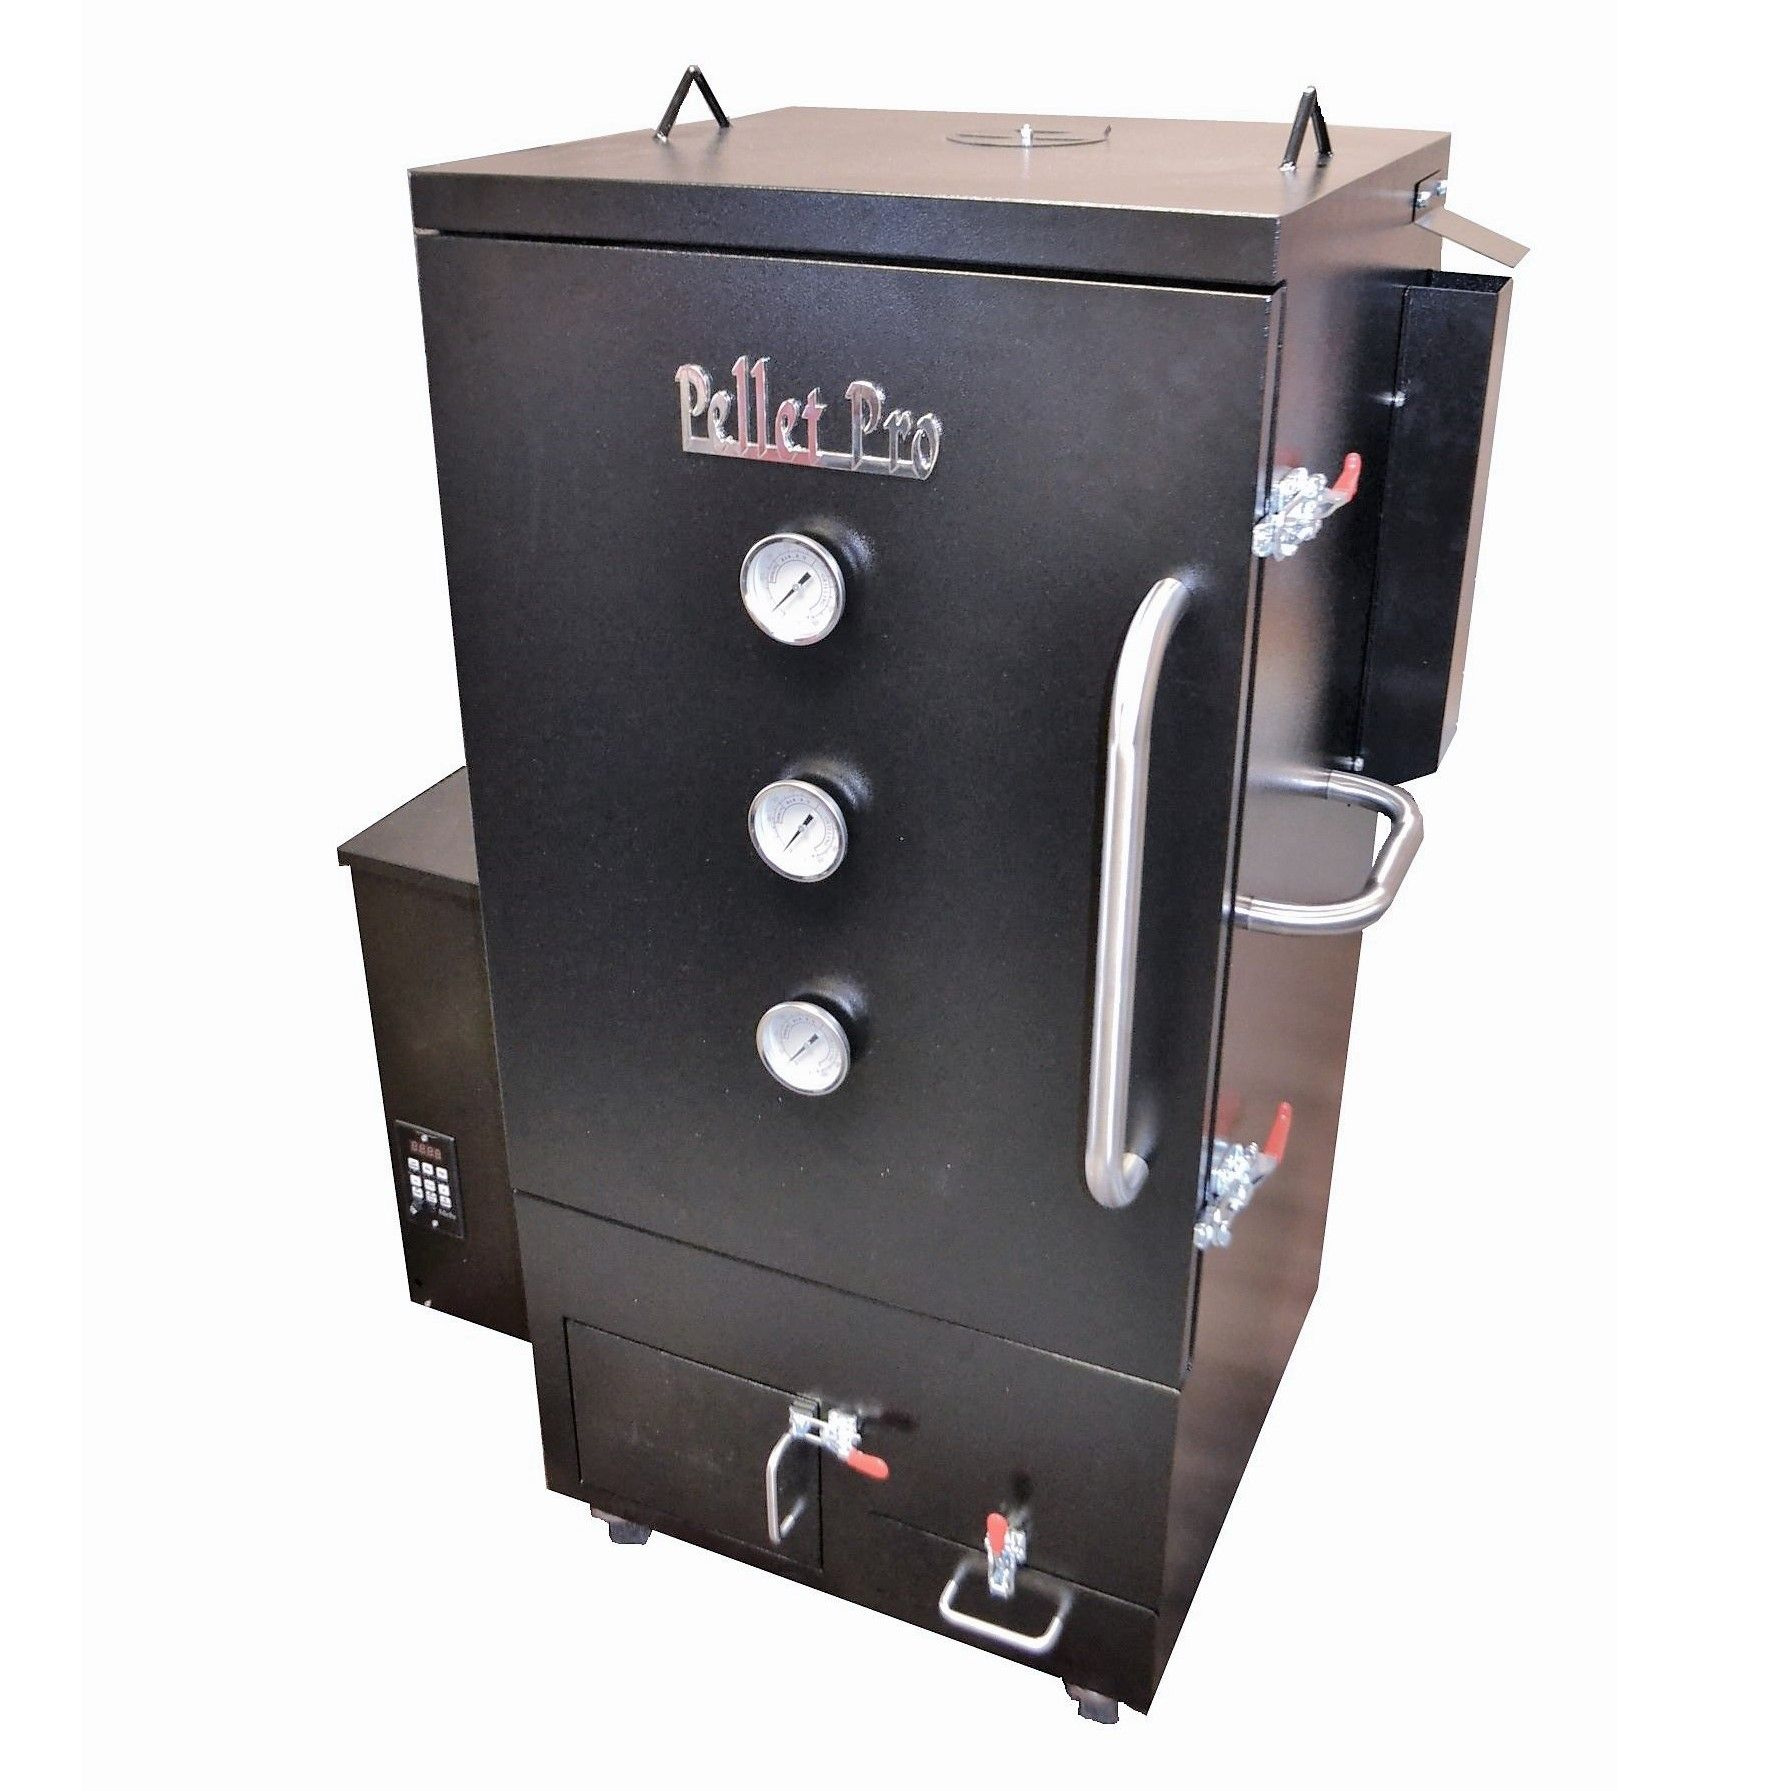 The Pellet Pro® Vertical Double Wall Pellet Smoker